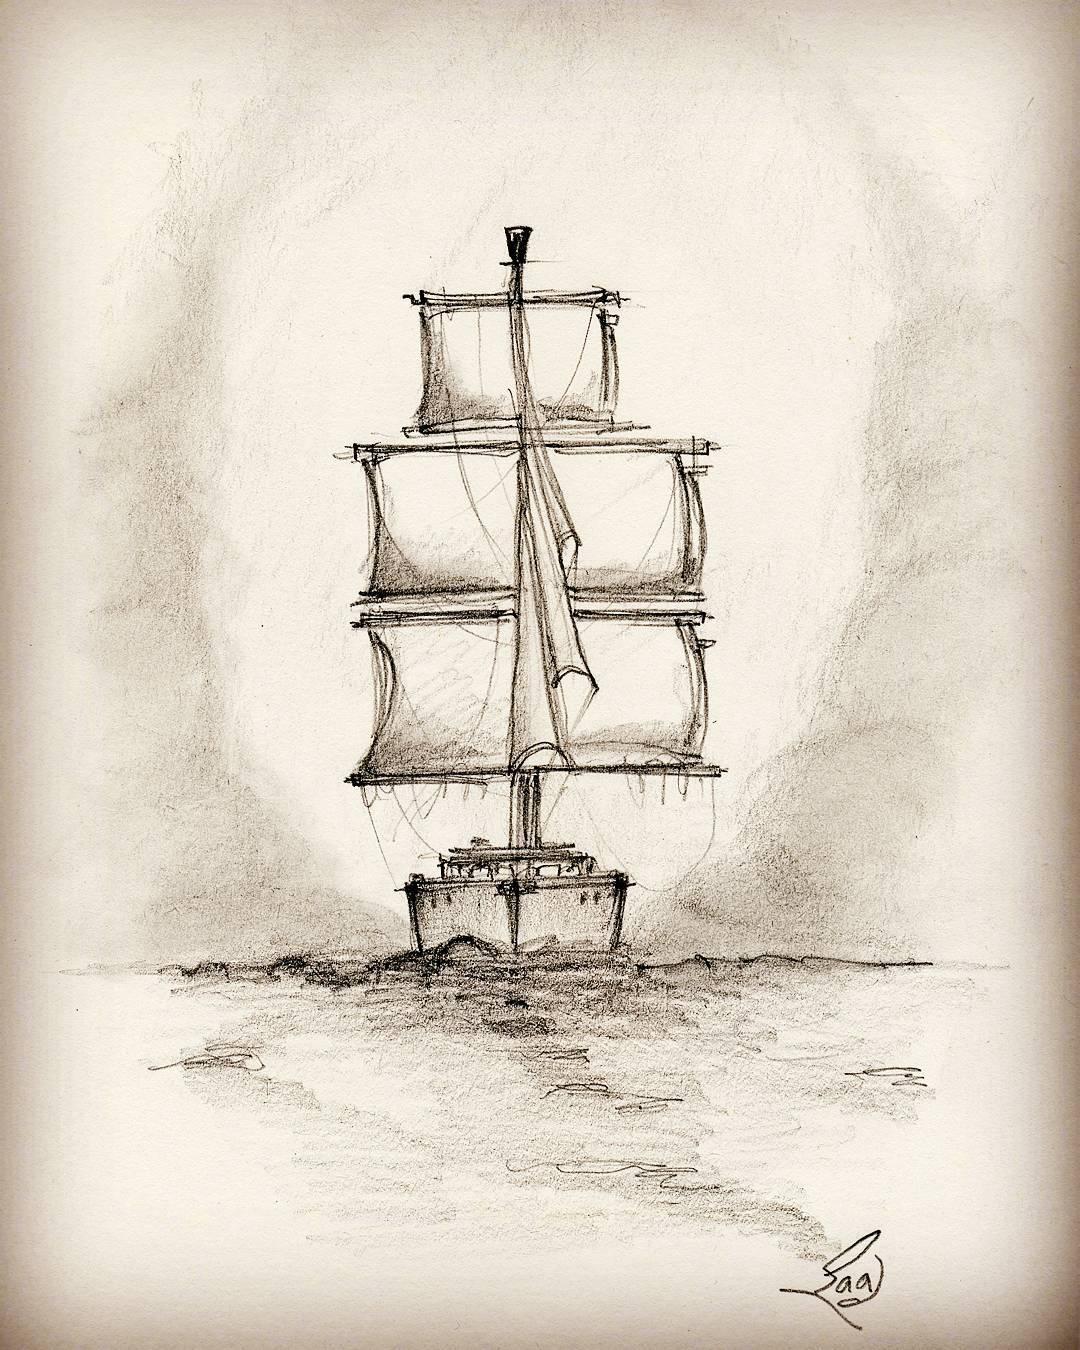 Pakistan clipart pencil sketch #art Sail Sailboat &